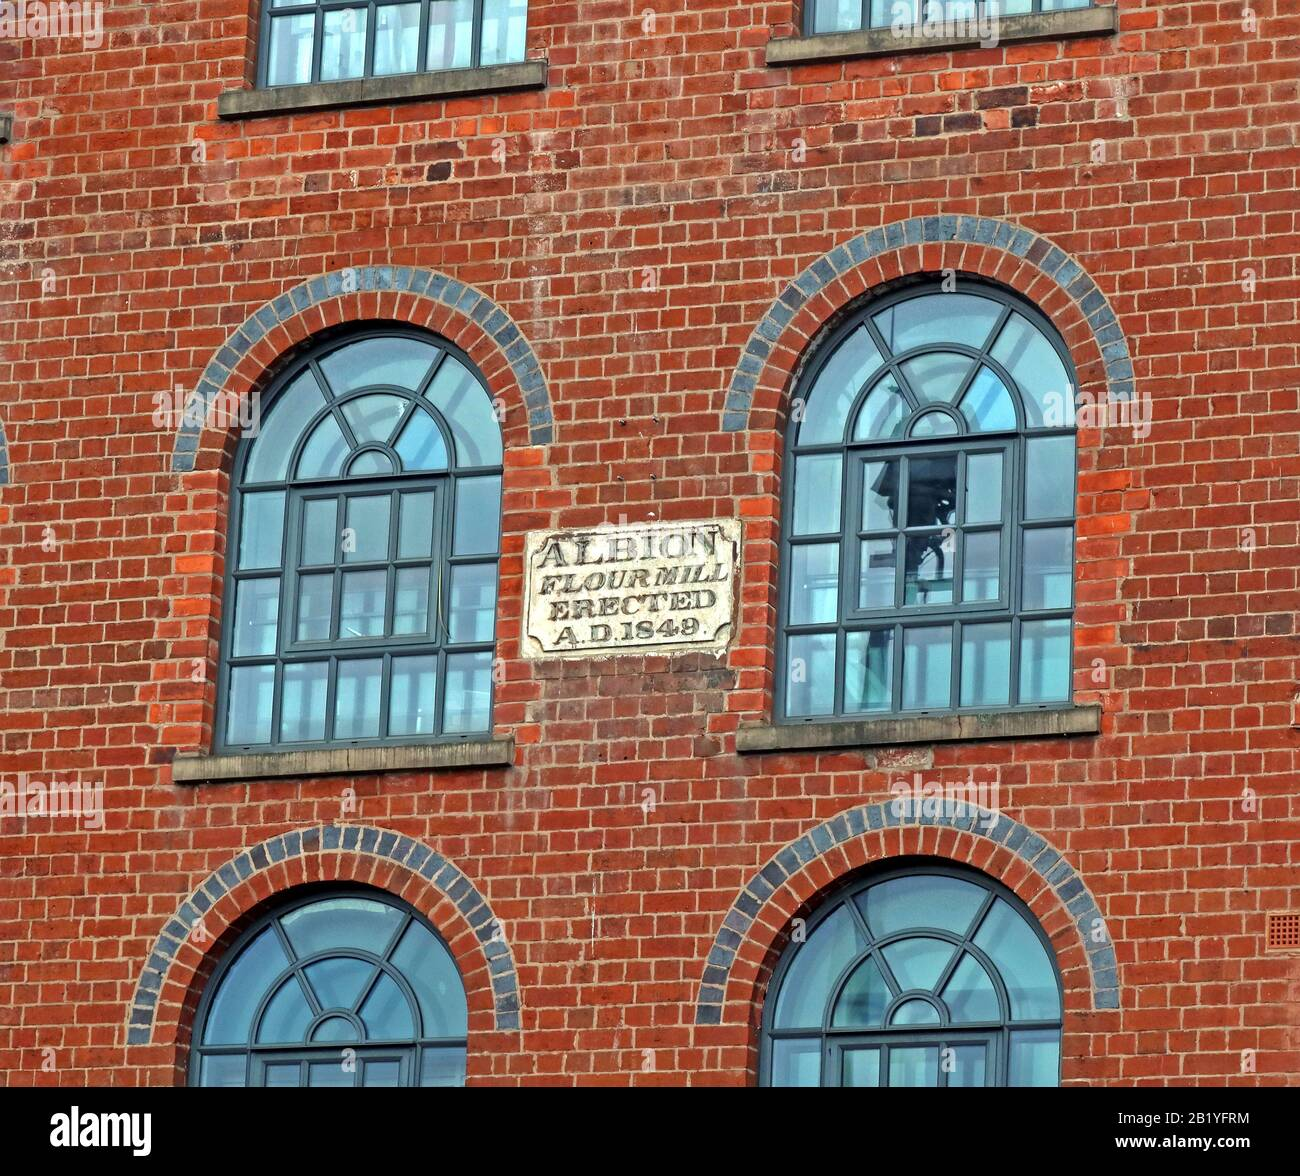 HotpixUK,@HotpixUK,GoTonySmith,UK,England,town,Albion,brick,Victorian,windows,flats,apartments,change of use,Midlands,historic,listed building,Albion Flour Mill,Smiths,Birchill,flight of locks,locks,Birchills,red brick,factory,mill,commercial,Albion Flour Mill now Smiths Flour Mill Walsall,EBL751,Steam Mill,Corn Mill,Flour Mill,Wolverhampton St,WS2 8DD,WS2,miller,Thomas Caloe